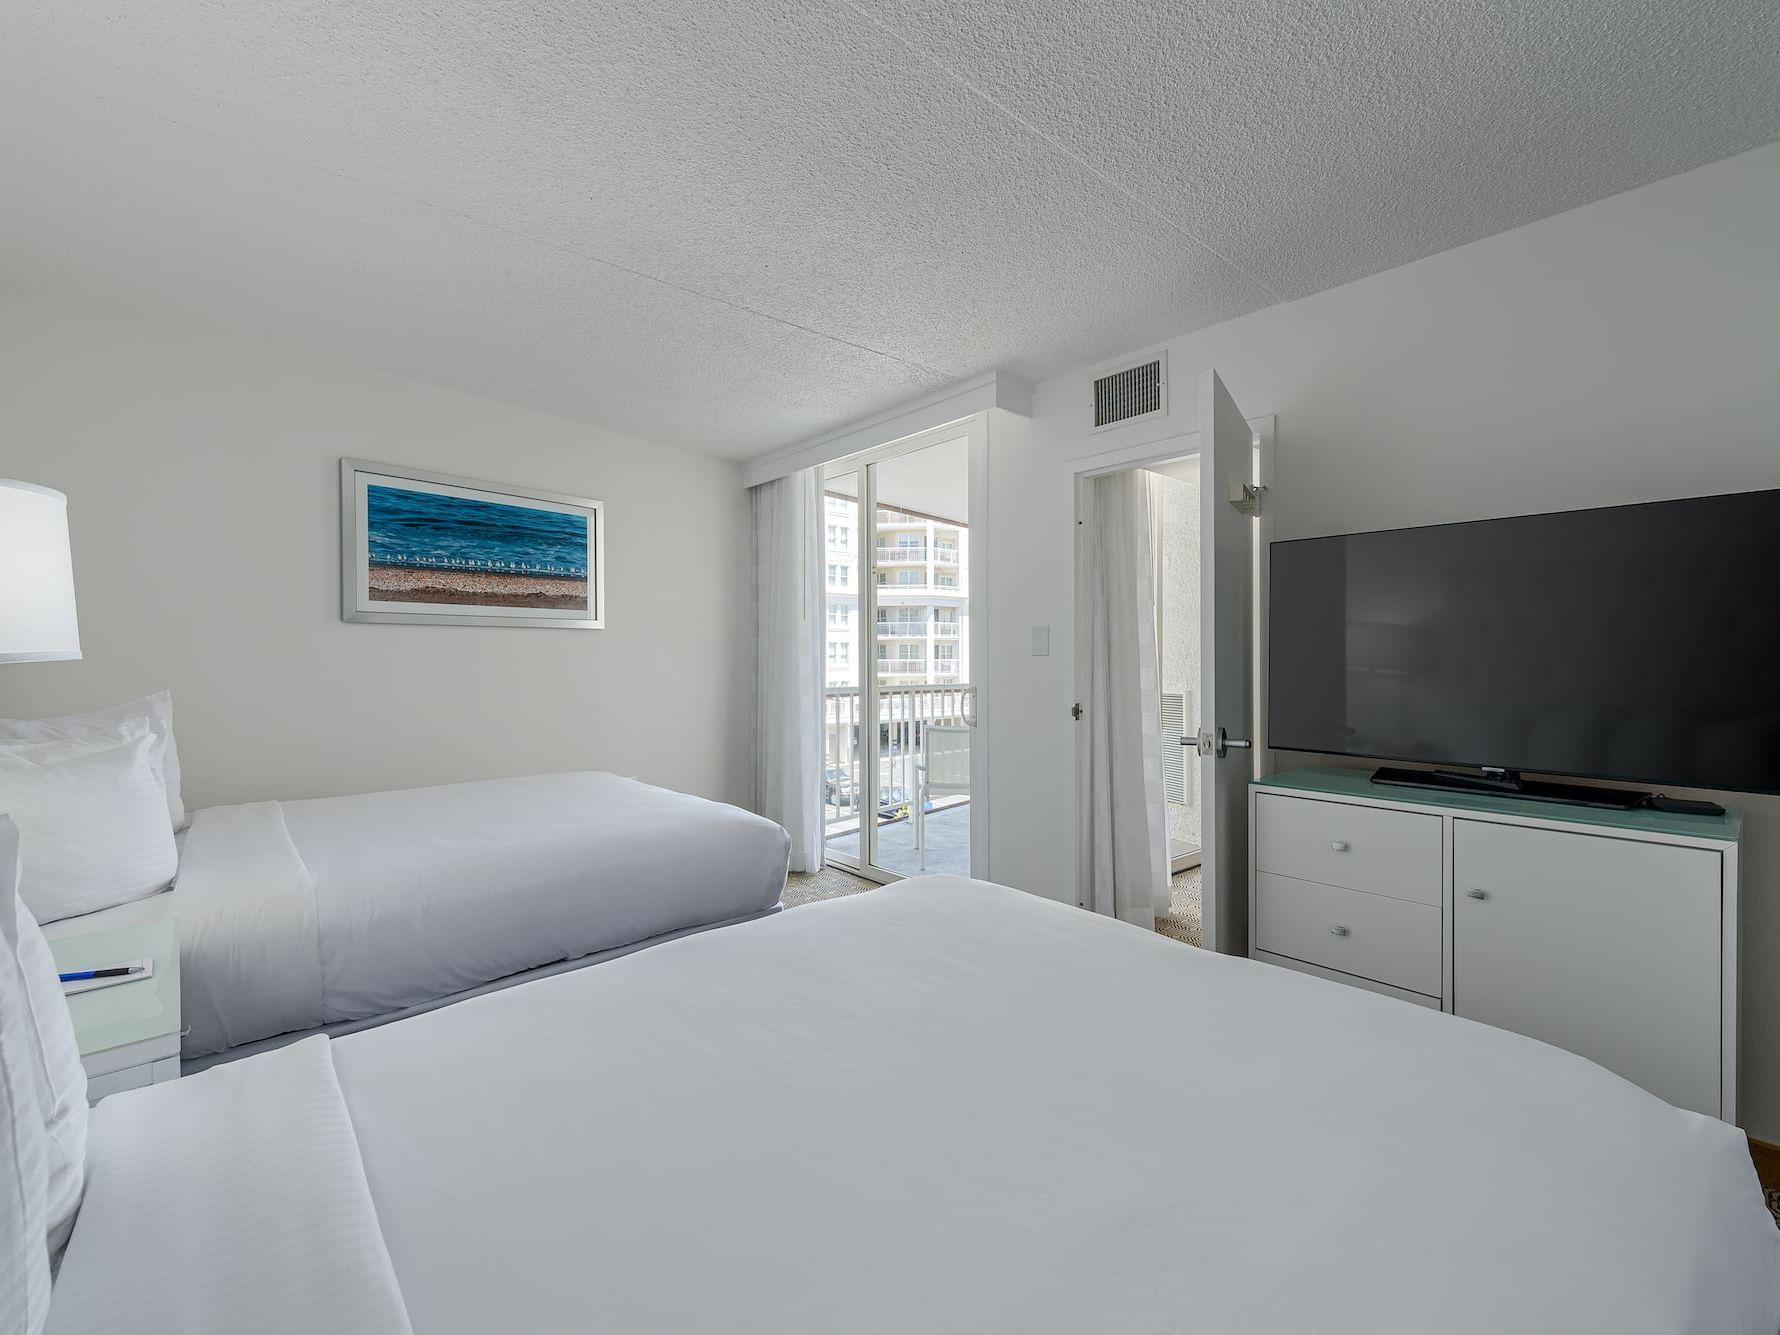 Signature Suite at ICONA Diamond Beach Resort Hotel near Wildwood NJ